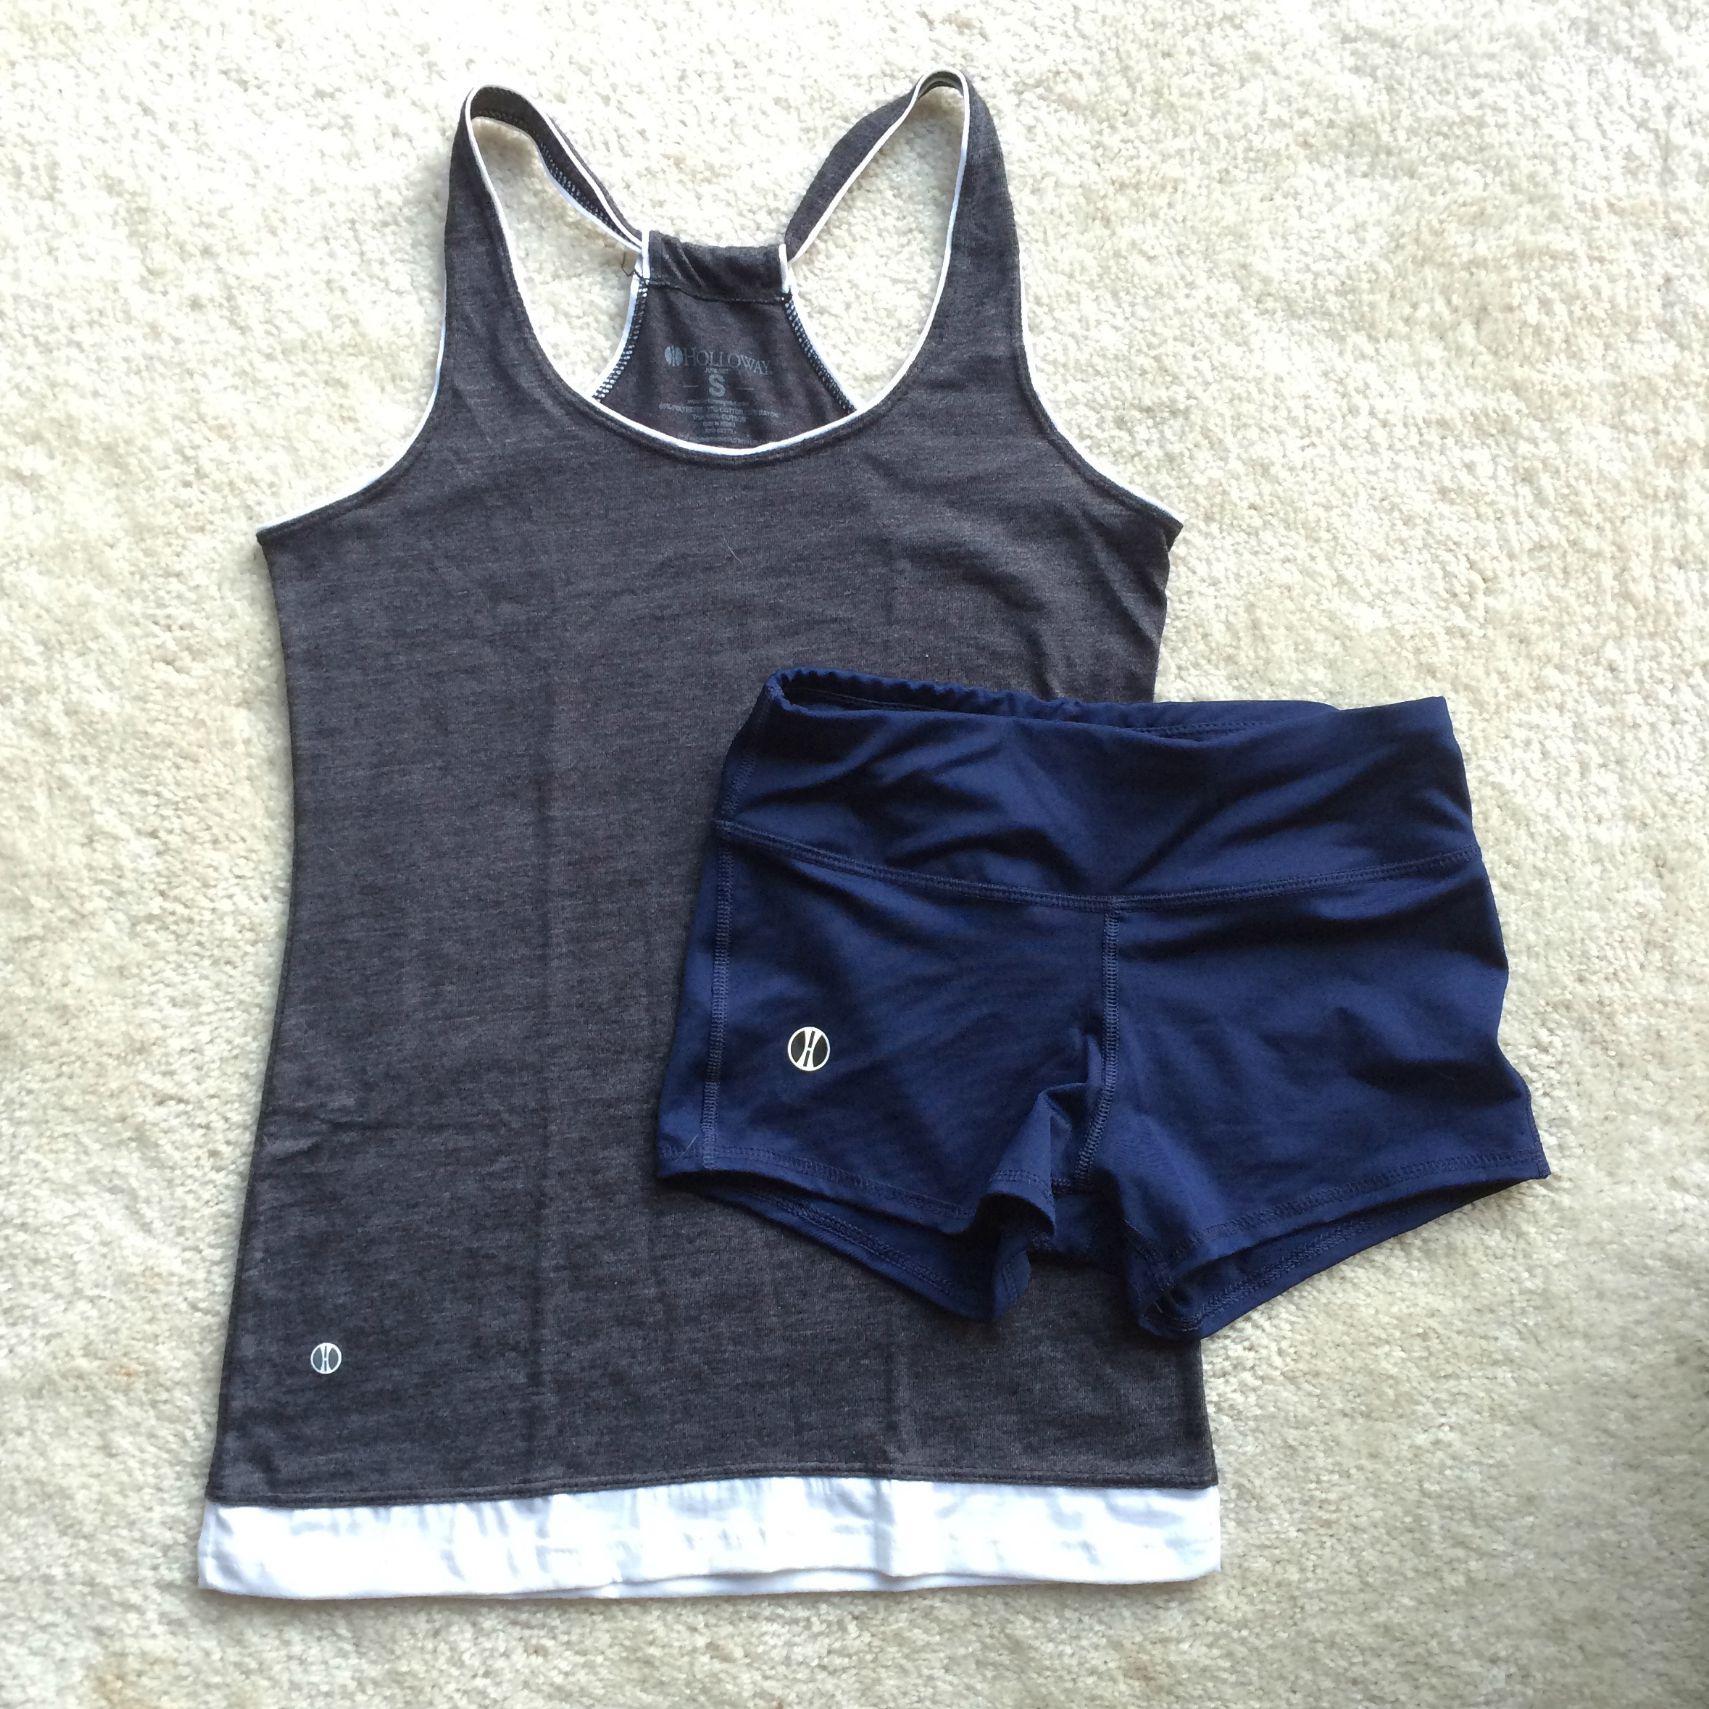 holloway usa sportswear